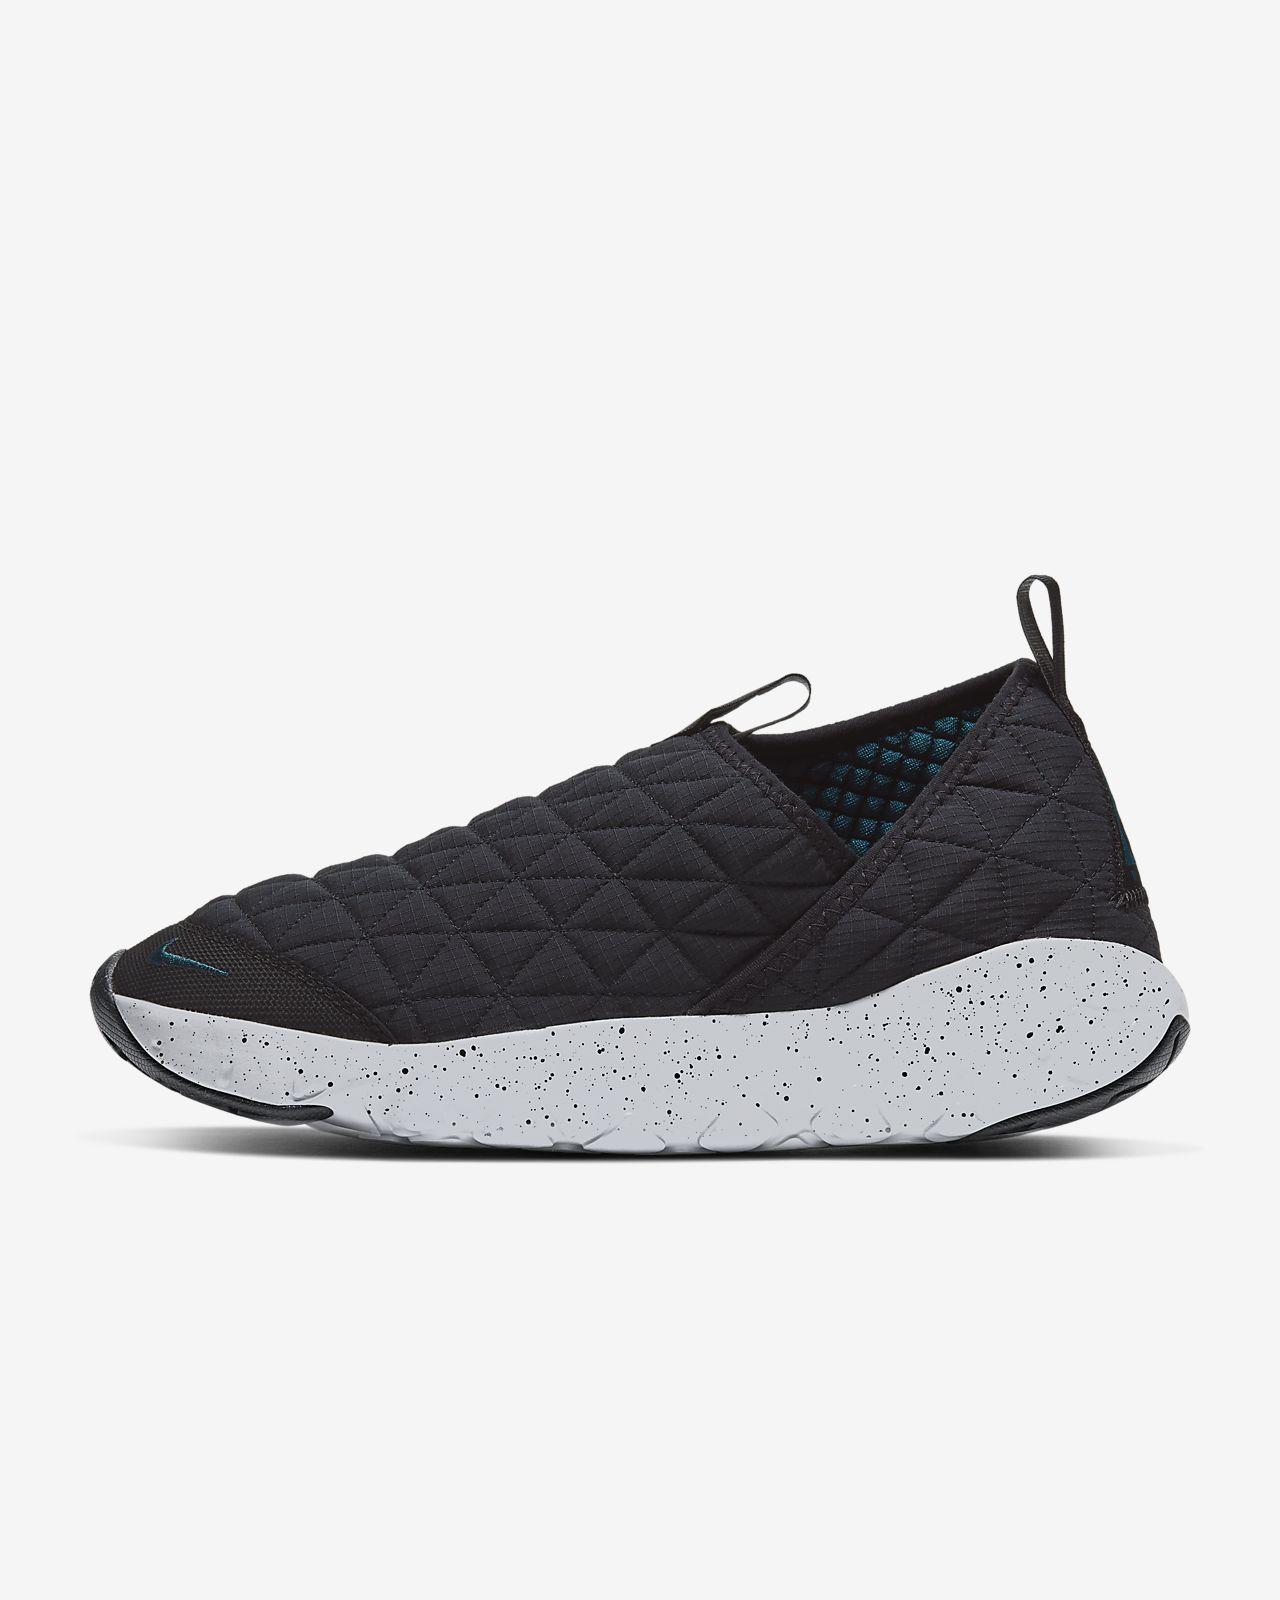 Sko Nike ACG MOC 3.0